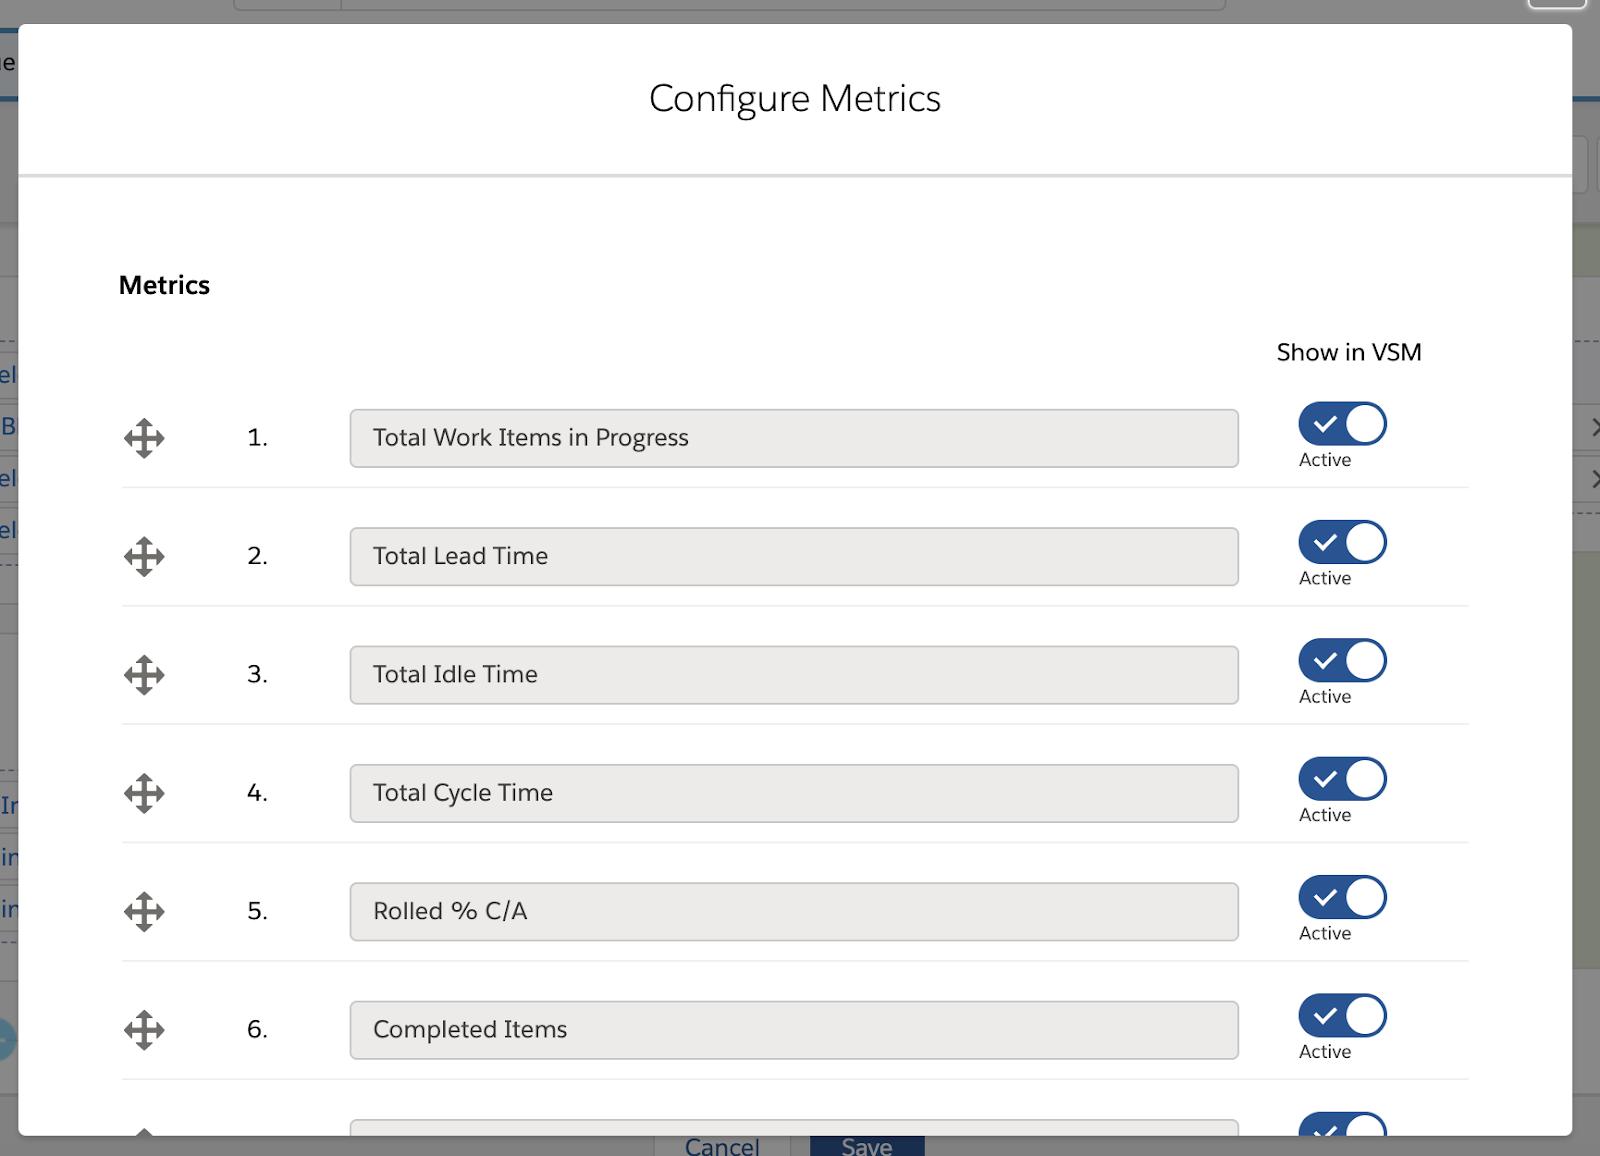 Configure Metrics page